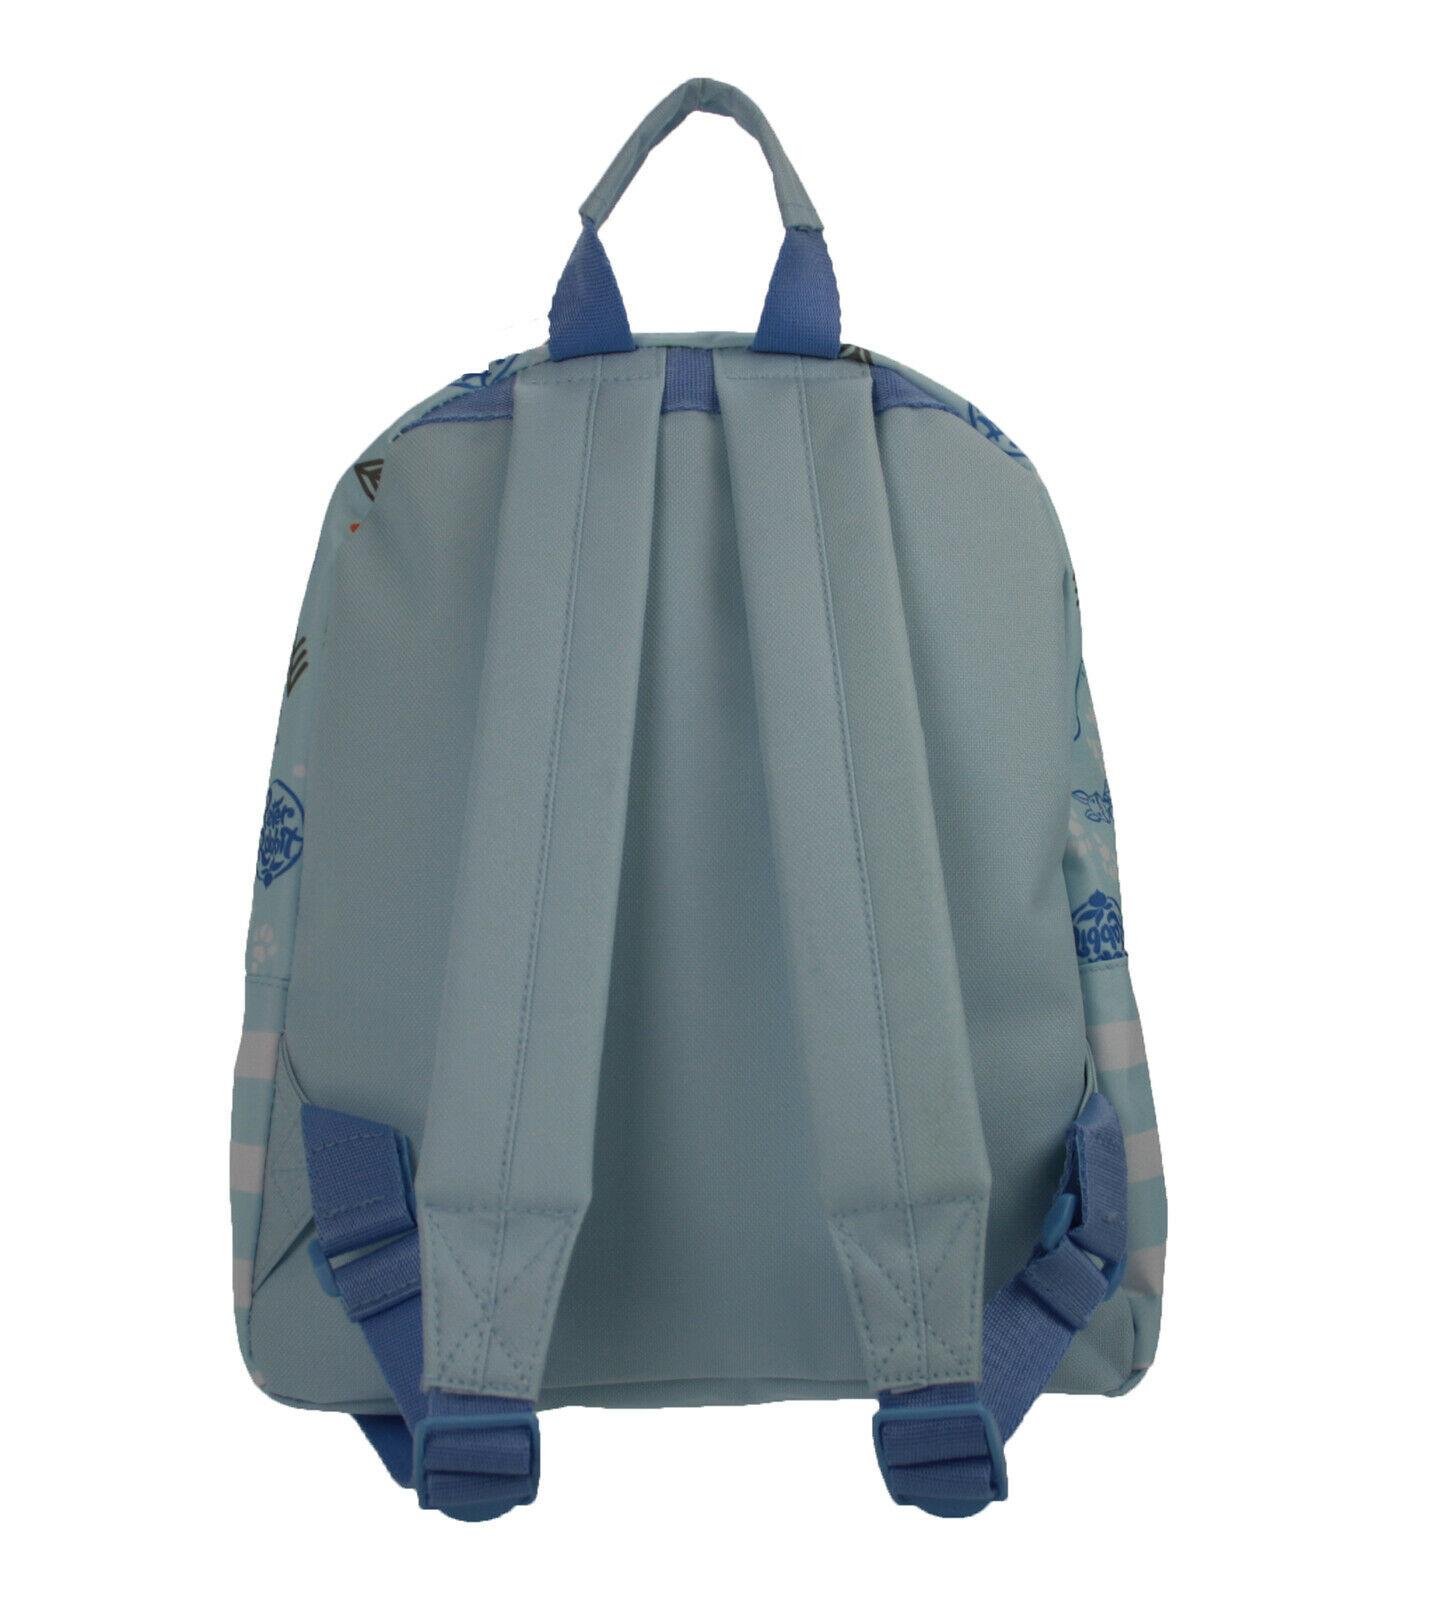 Peter Rabbit Boys Mini Roxy School Bag Rucksack Backpack